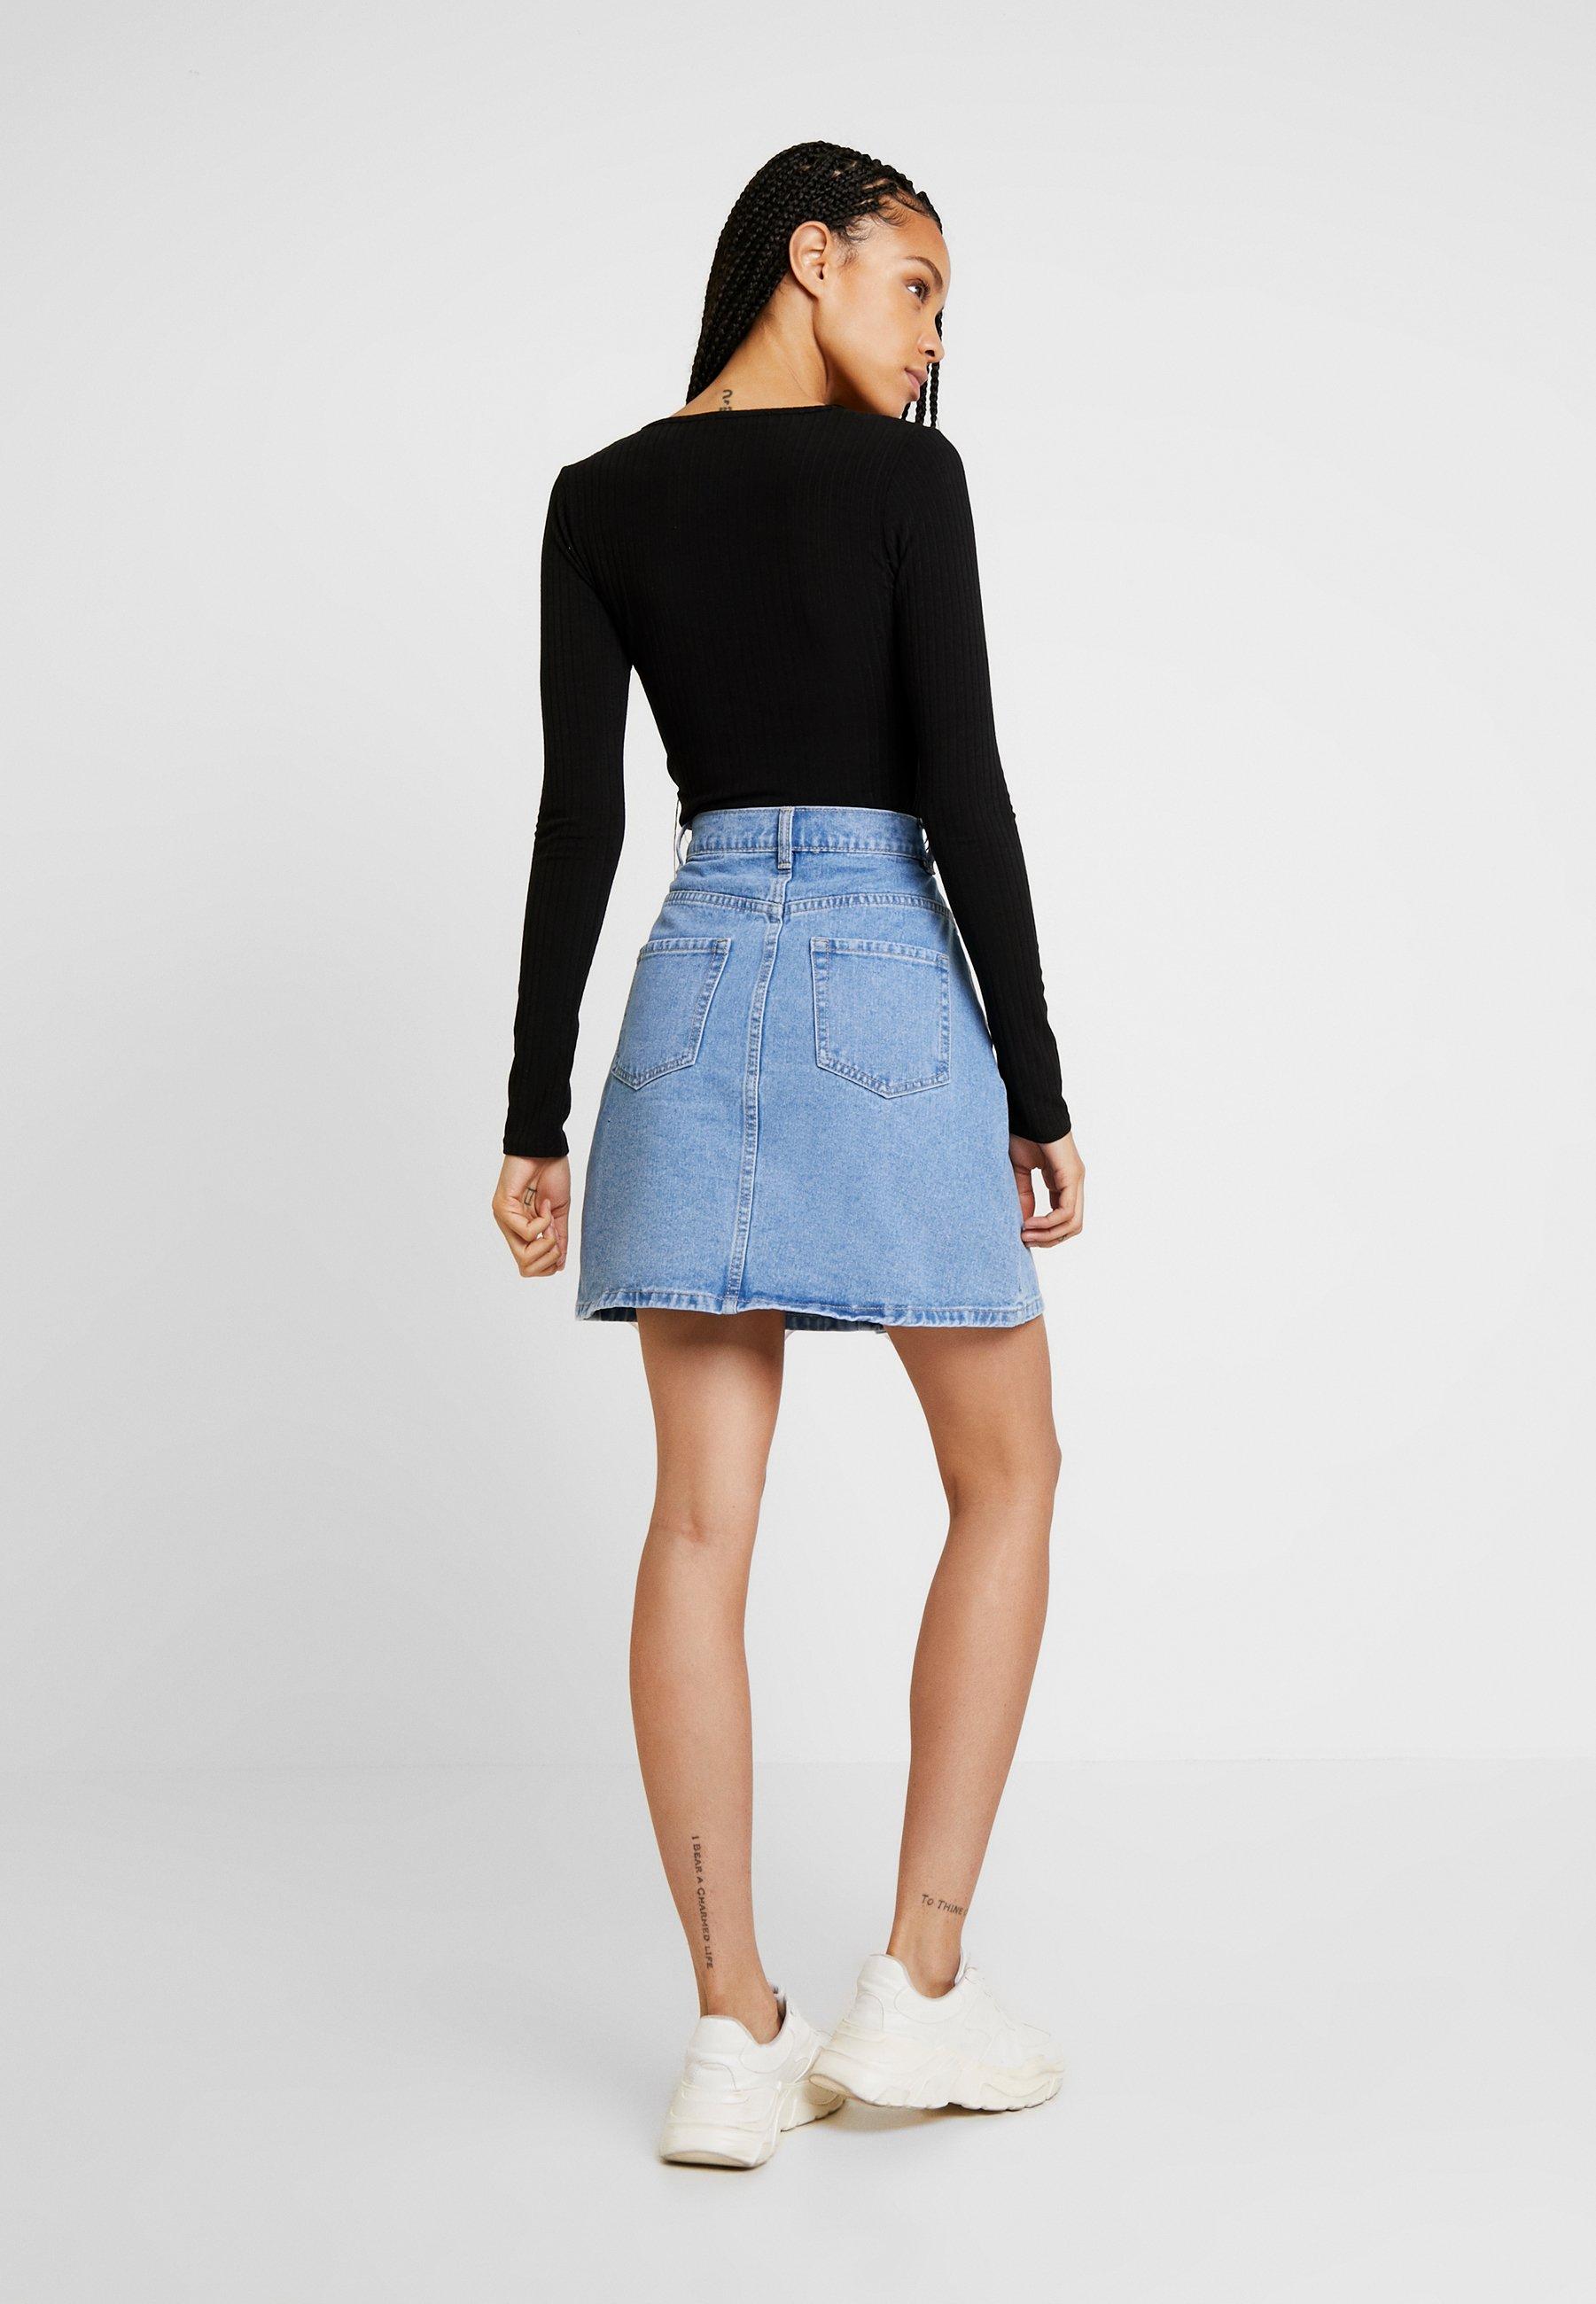 Jean Light En Pcfate Pieces Button SkirtShort Blue Denim 9EHD2I